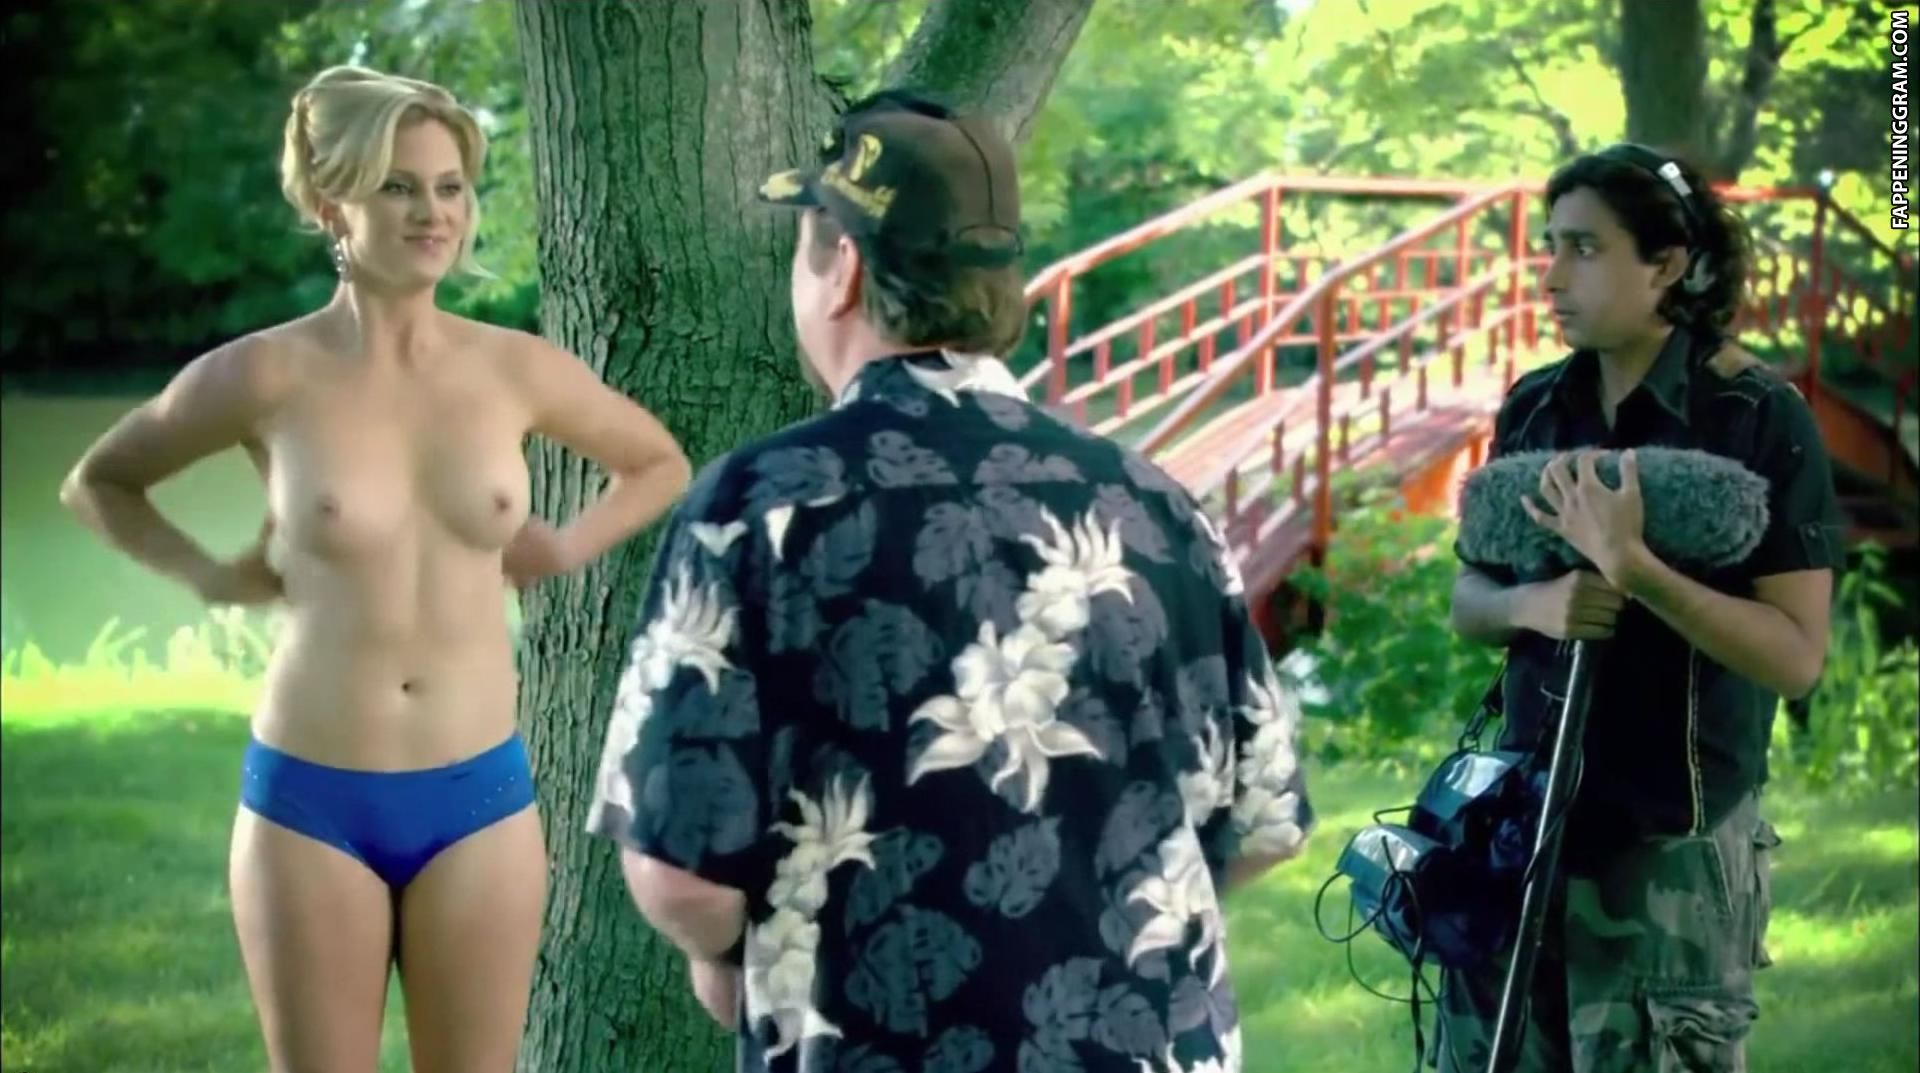 Arbor nude nicole 41 Hottest